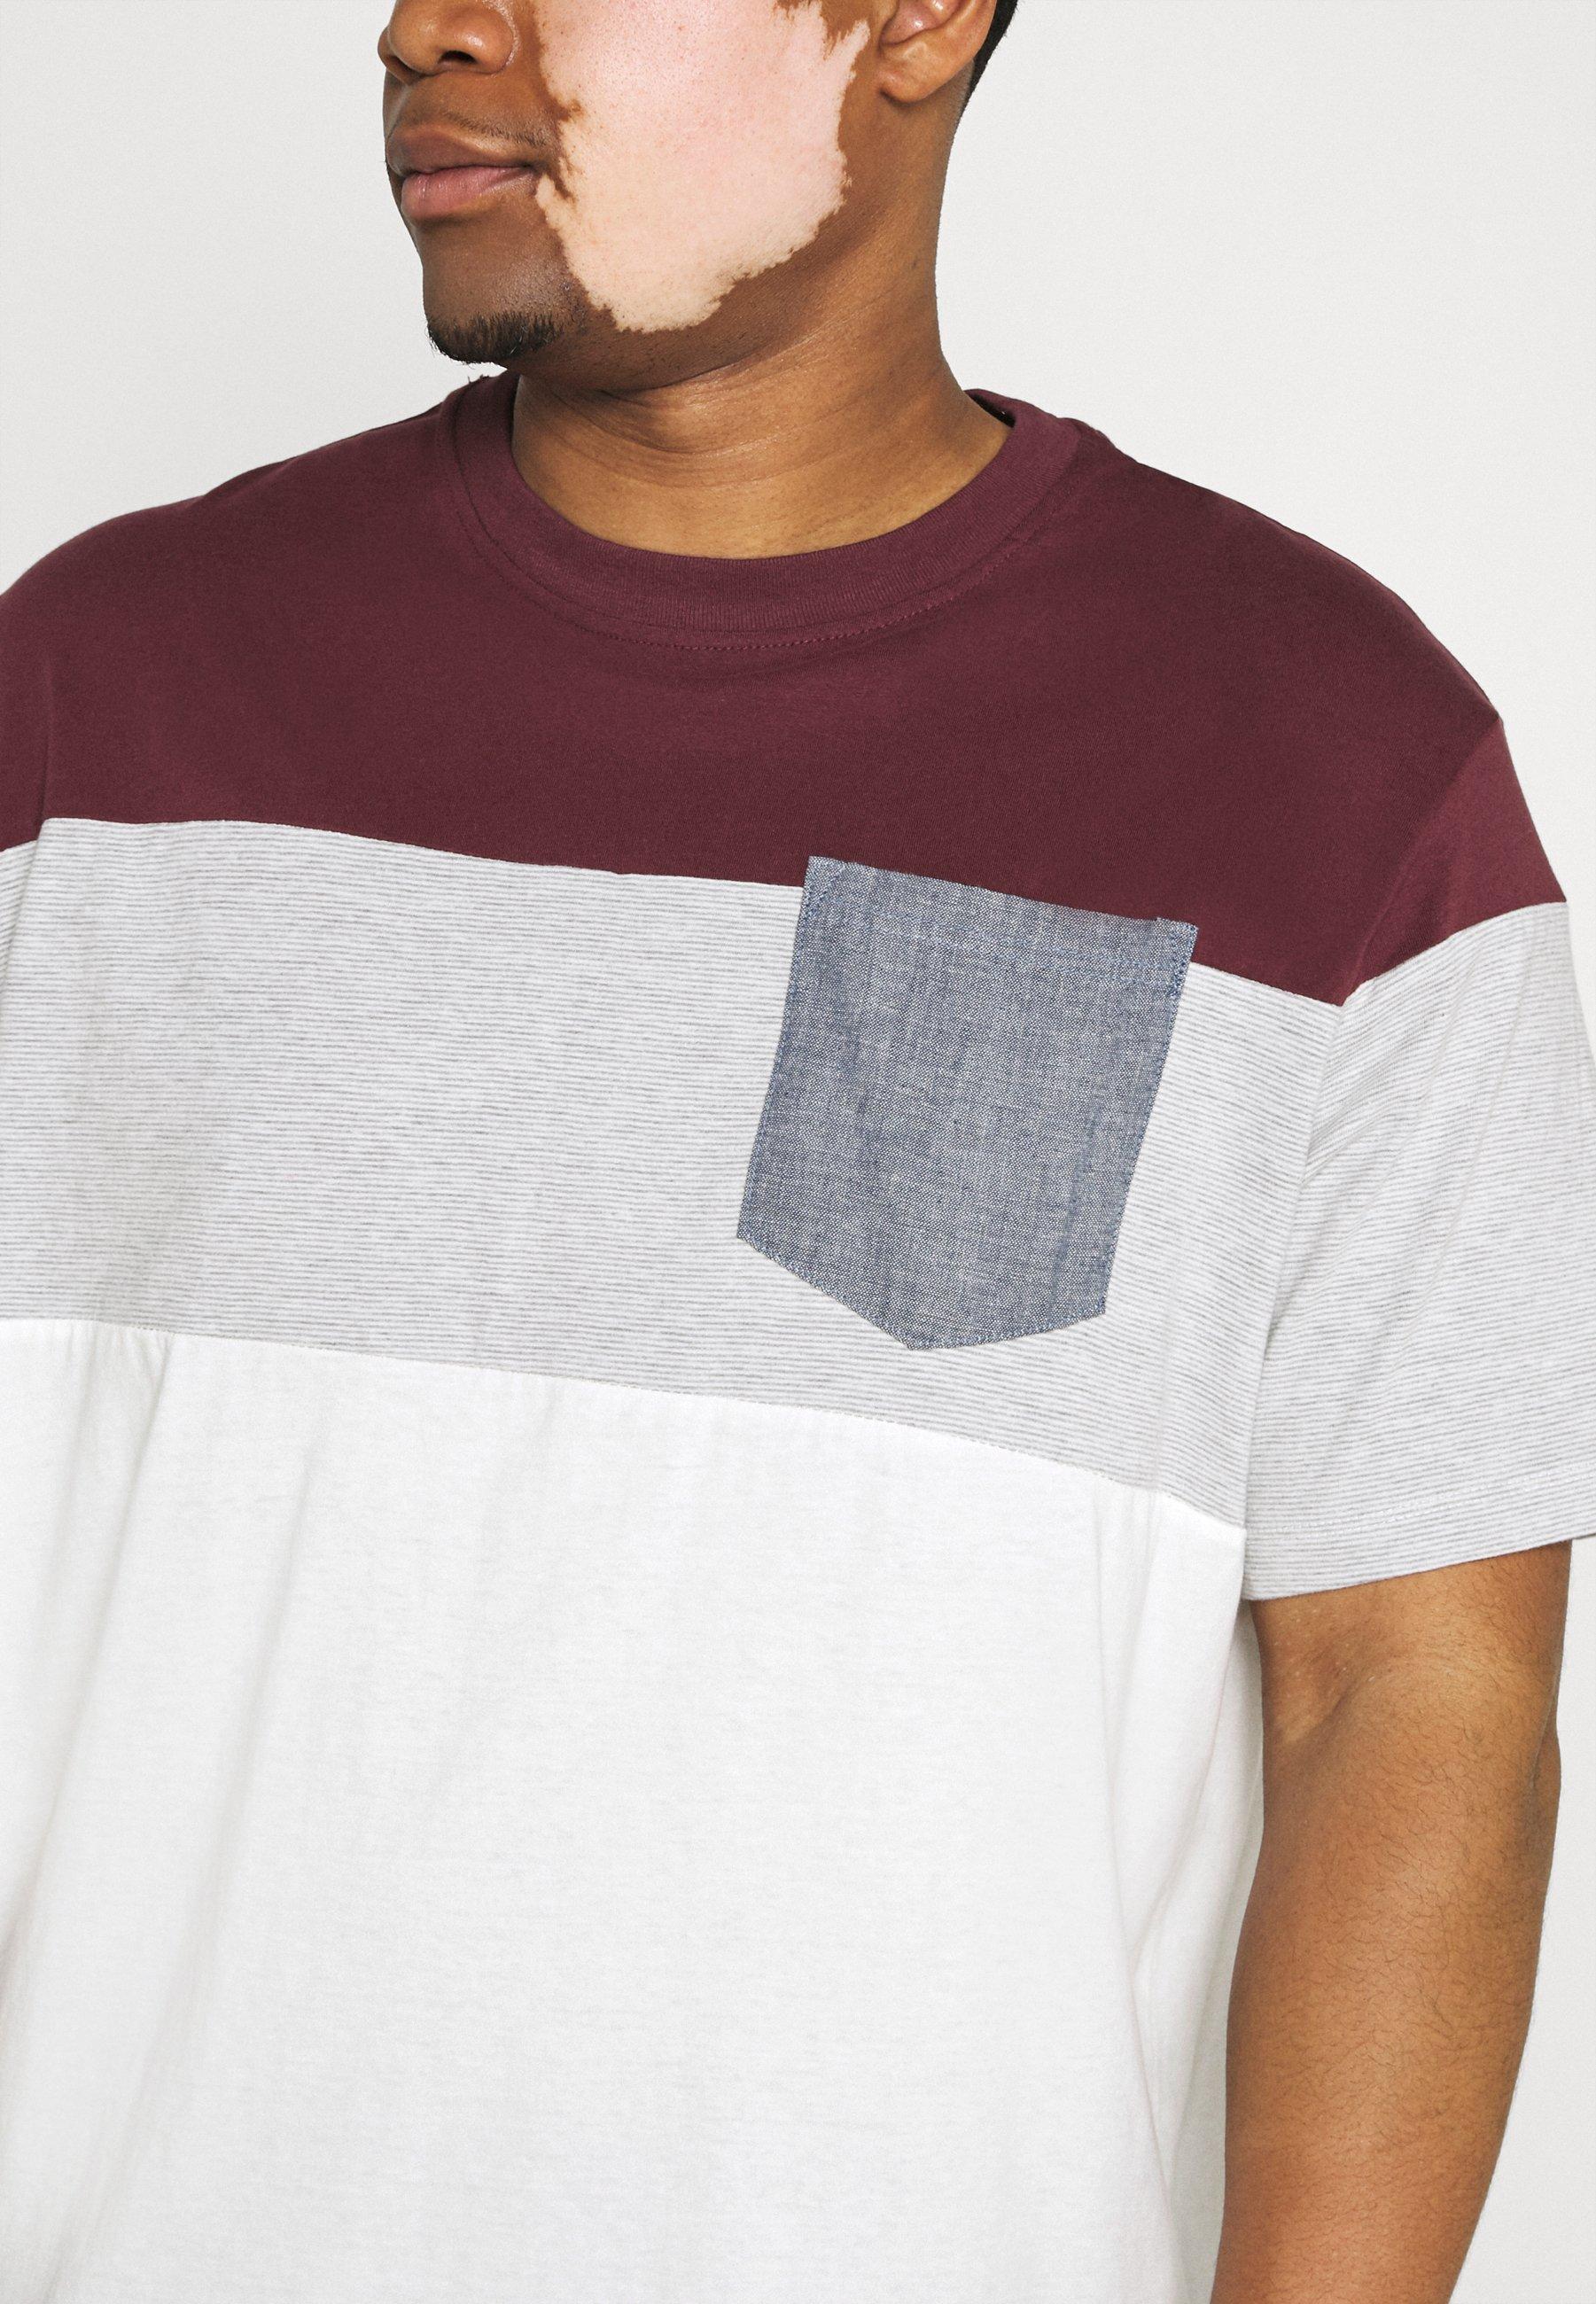 Jack & Jones JJCONTRAST POCKET TEE CREW NECK - Print T-shirt - port royale iGWmp